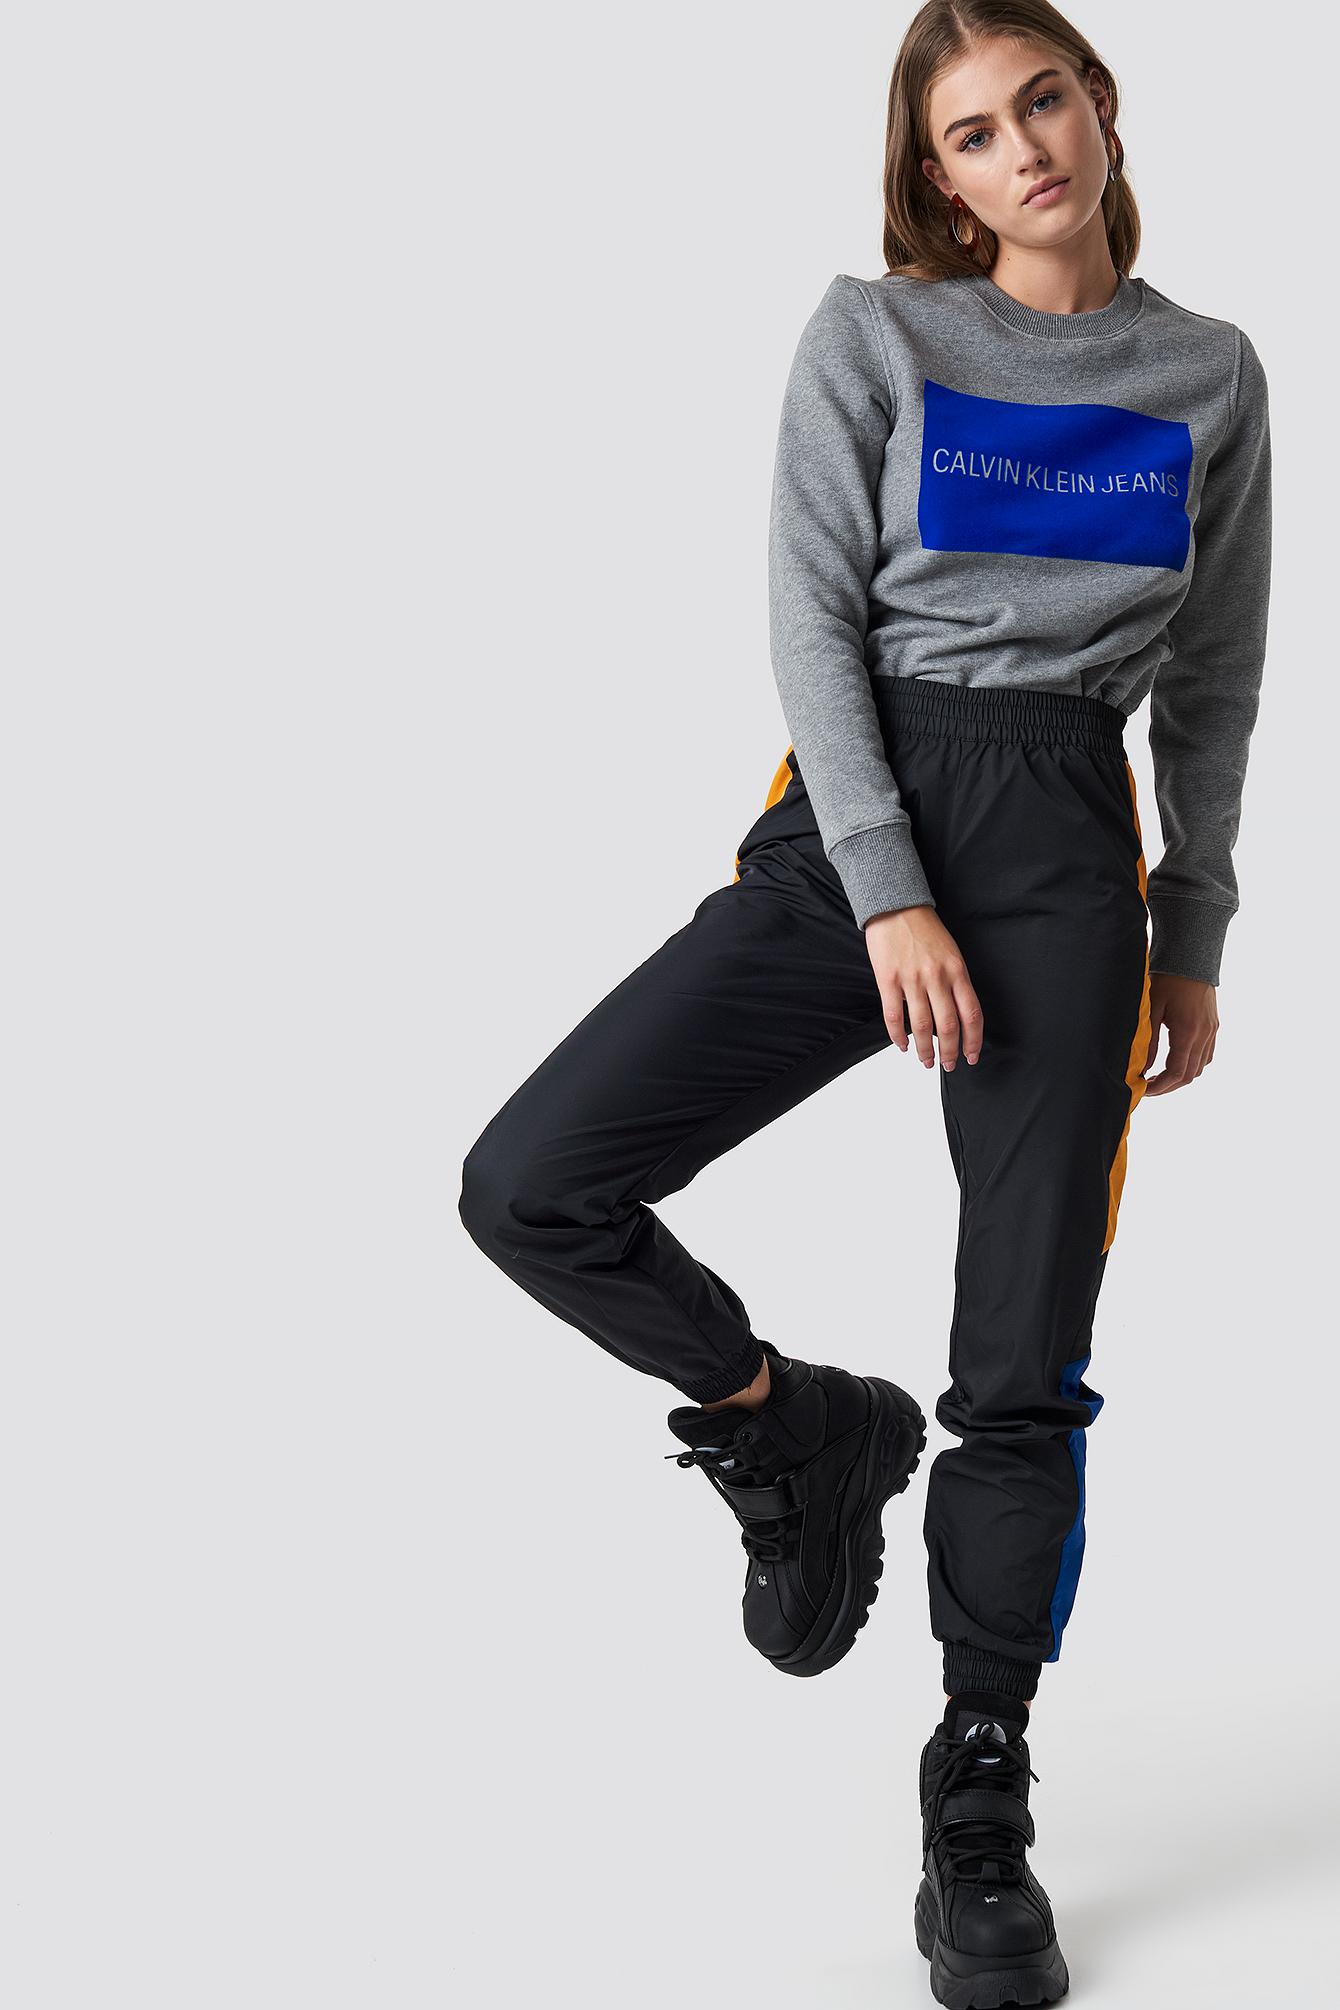 Institutional Flock Box Reg Sweater NA-KD.COM